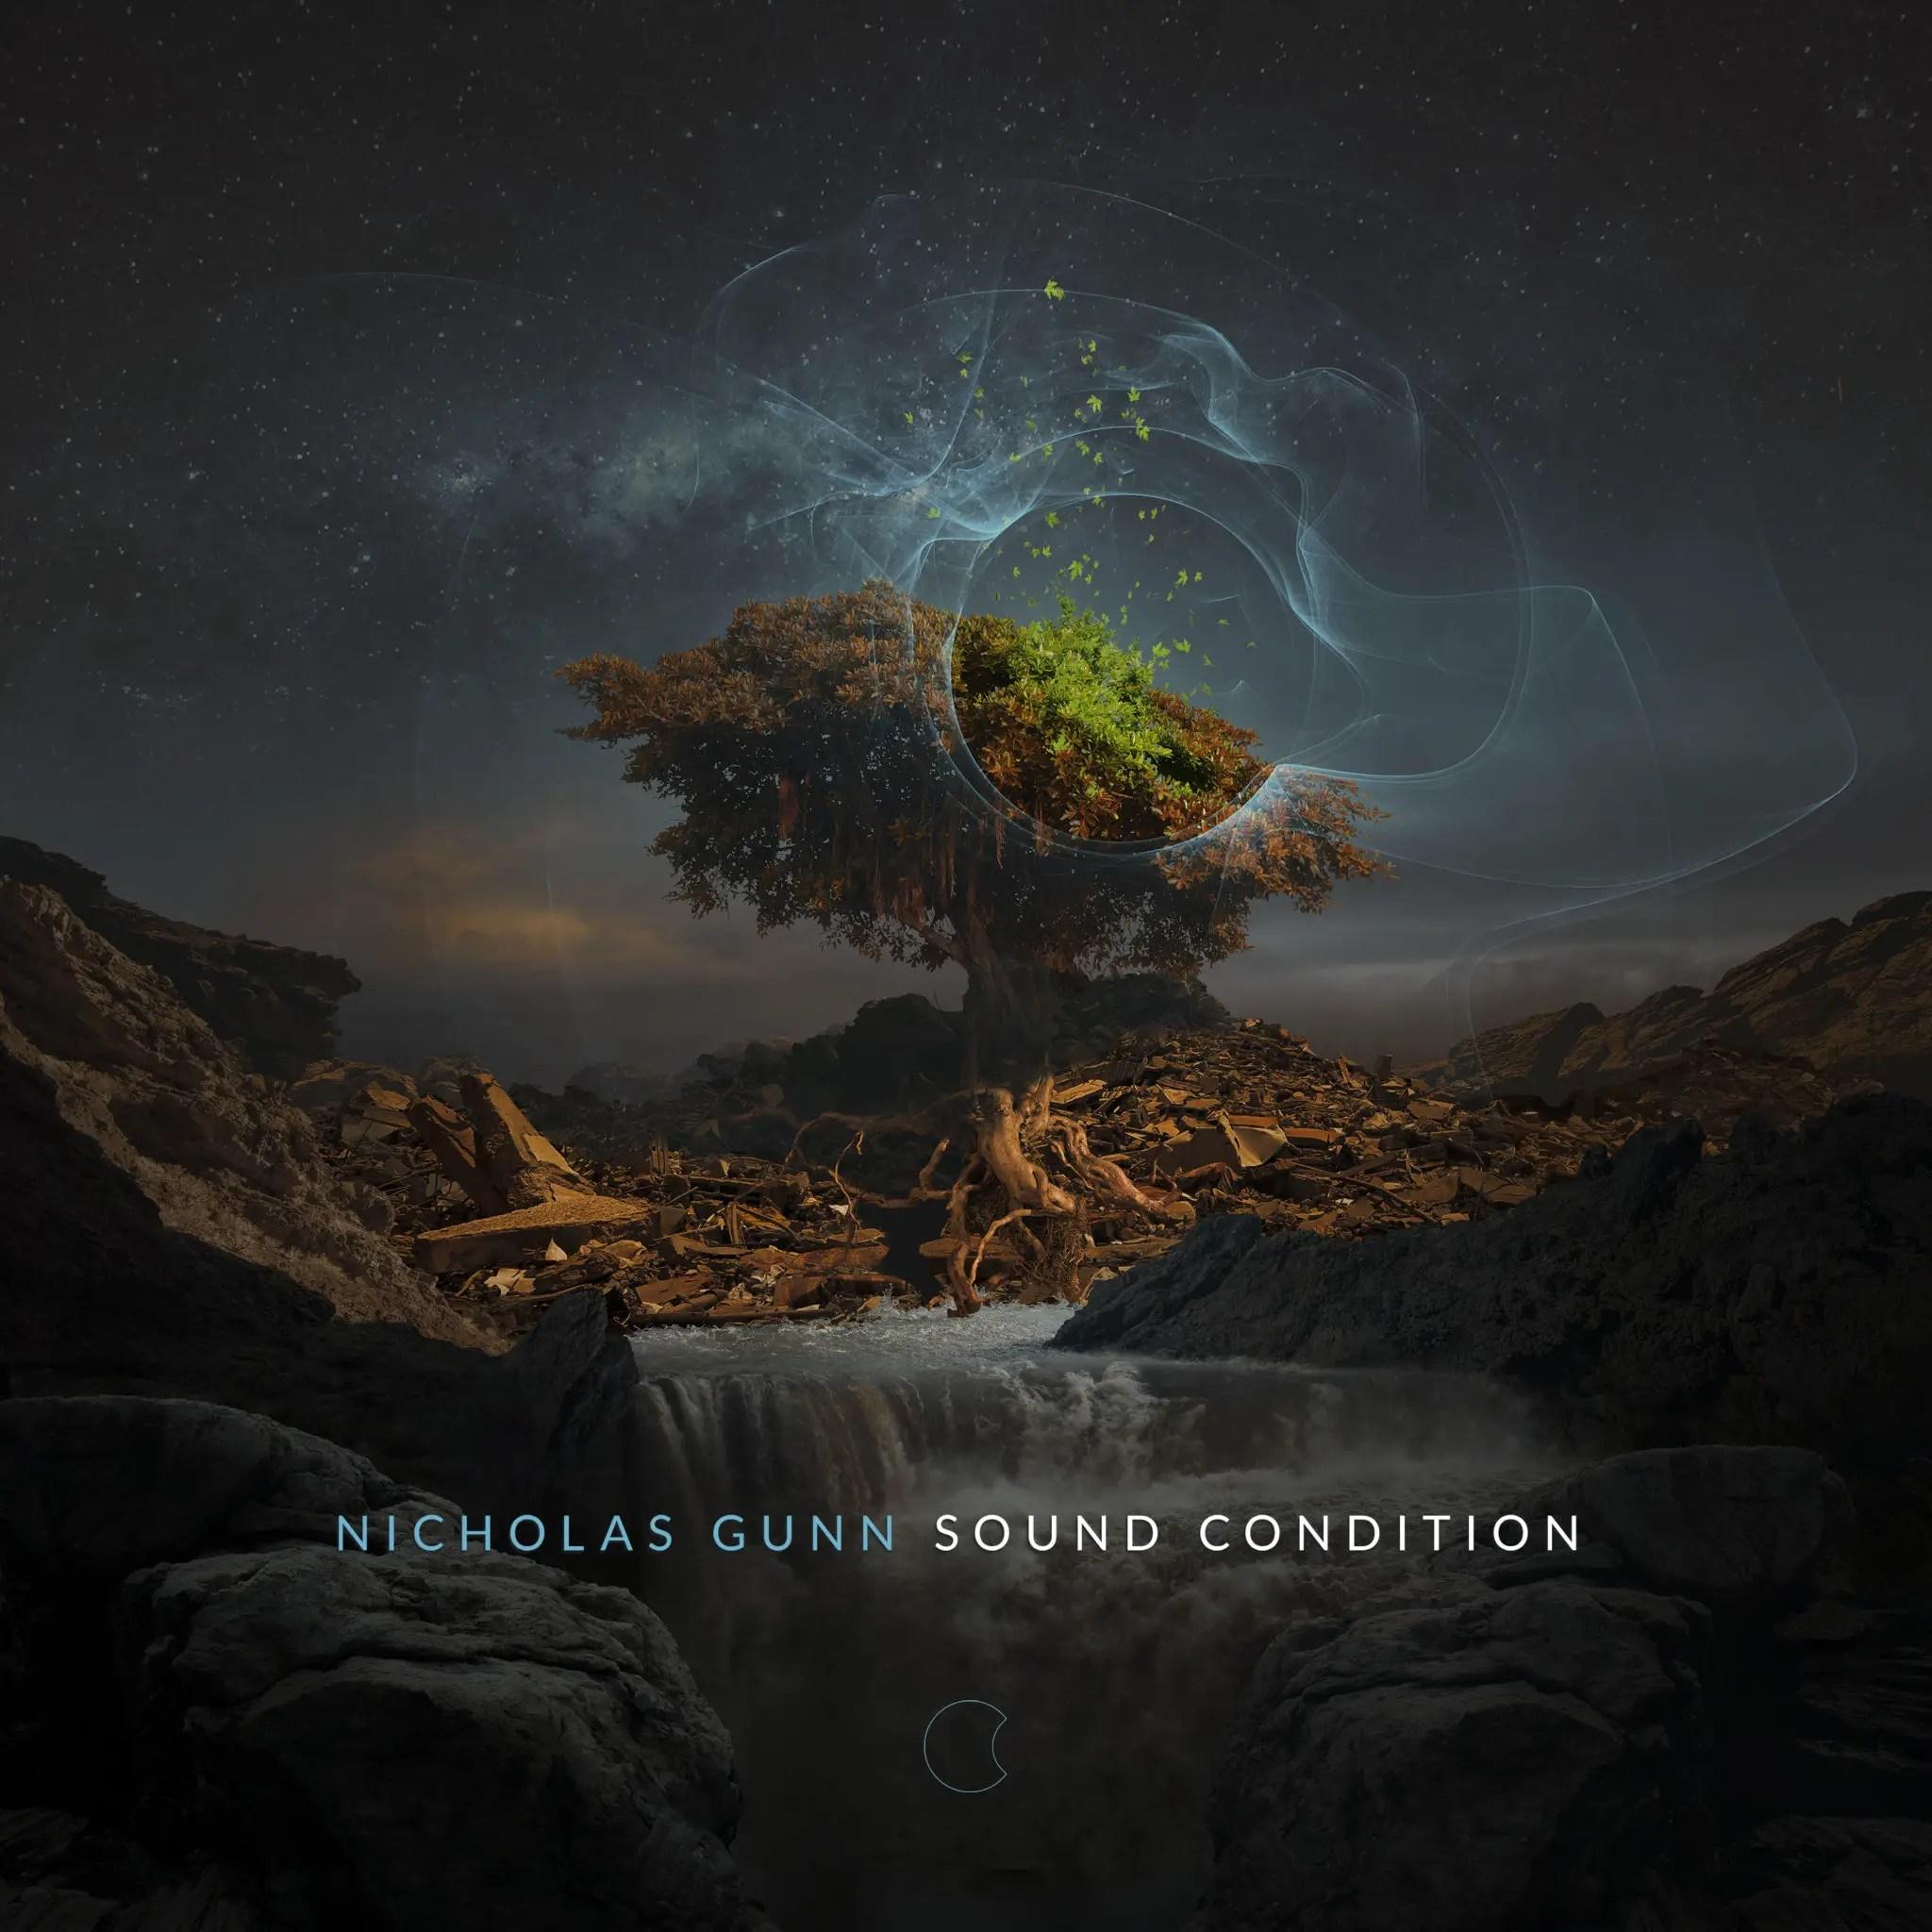 Nicholas Gunn - 'Sound Condition' Reaction | Opinions | LIVING LIFE FEARLESS